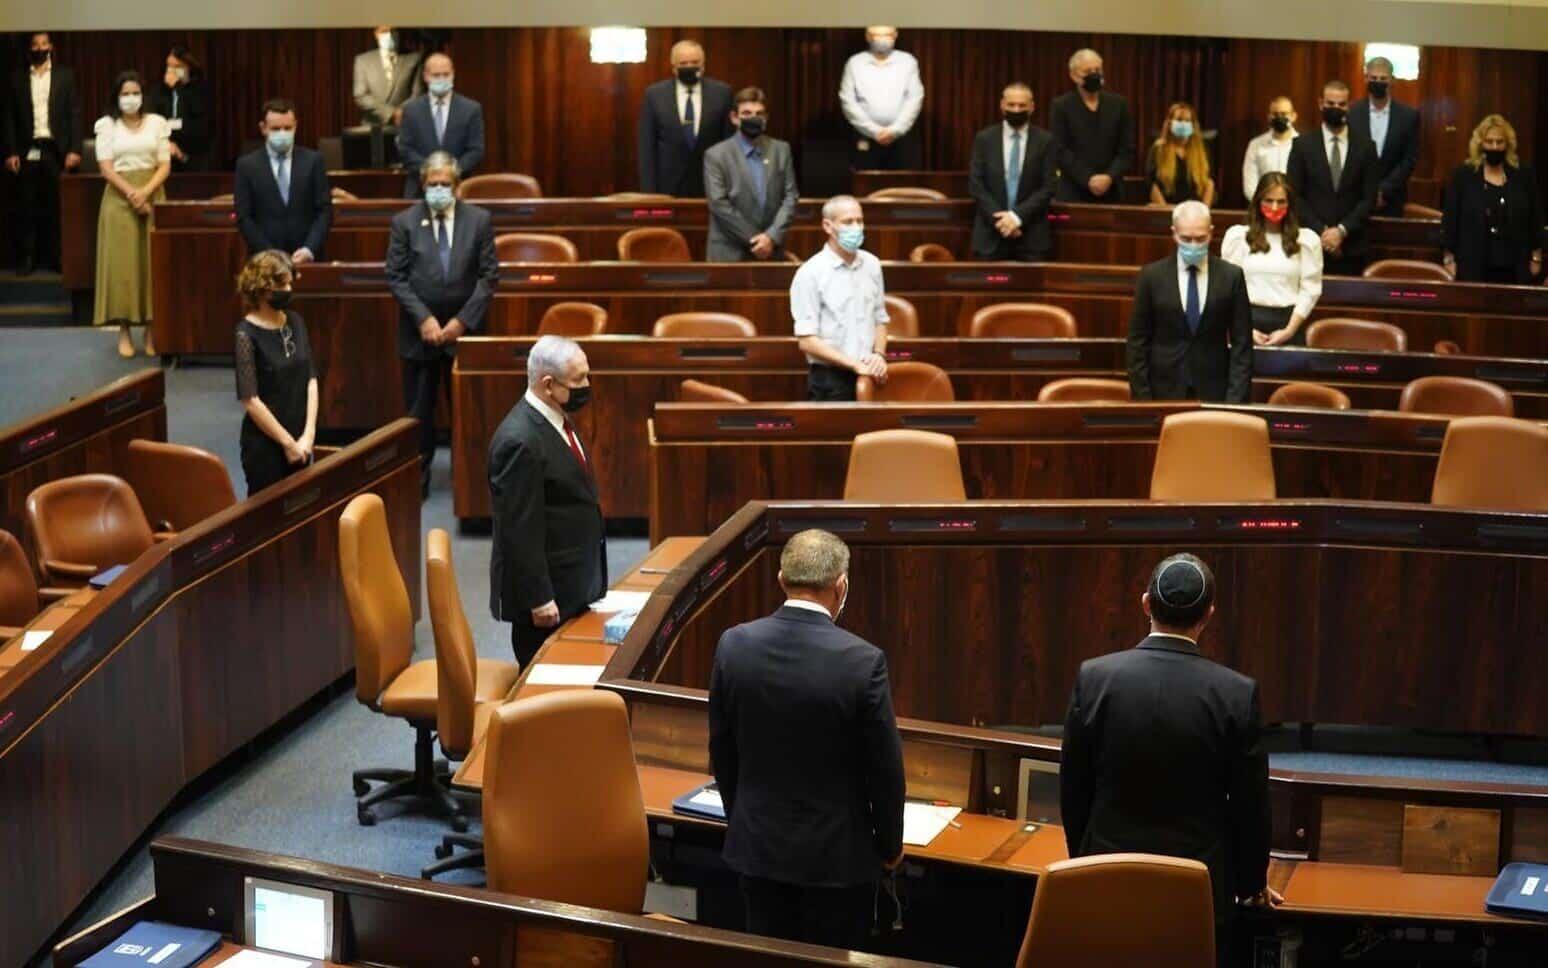 В Кнессете одобрили сокращение зарплат госслужащим